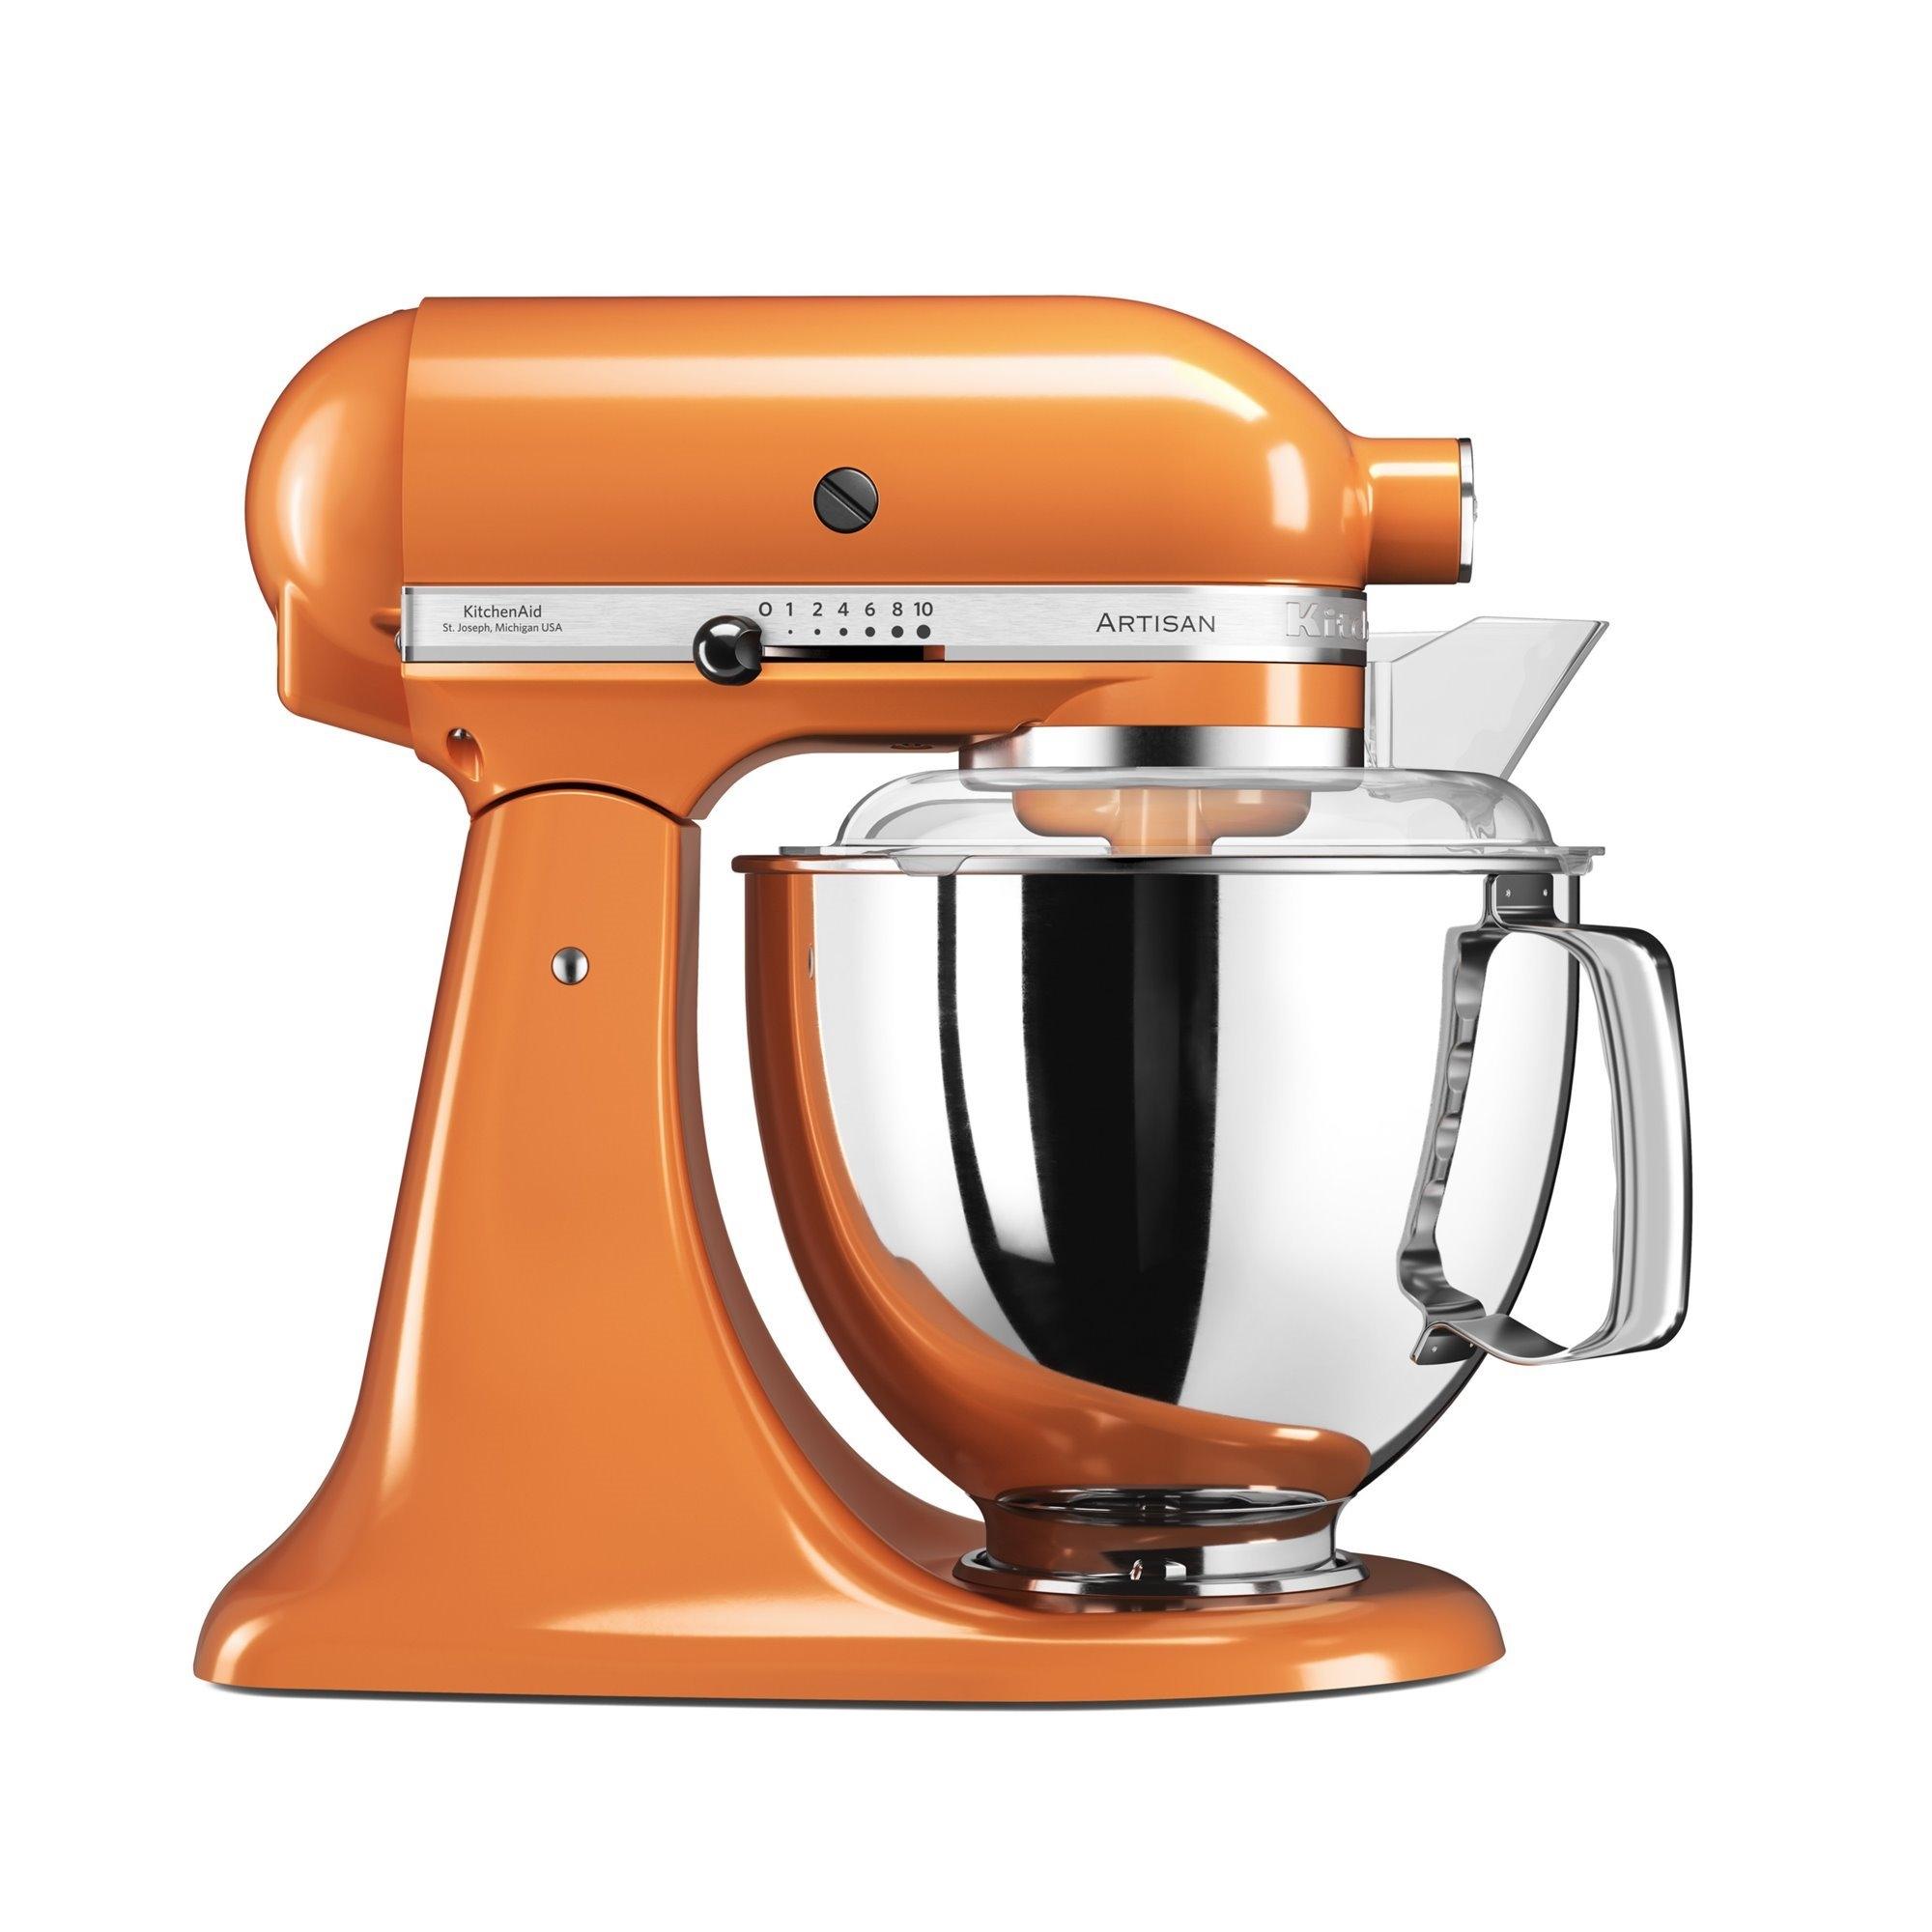 Mixer cu bol Artisan Elegance 5KSM175PSETG 48 L Tangerine 300W KitchenAid